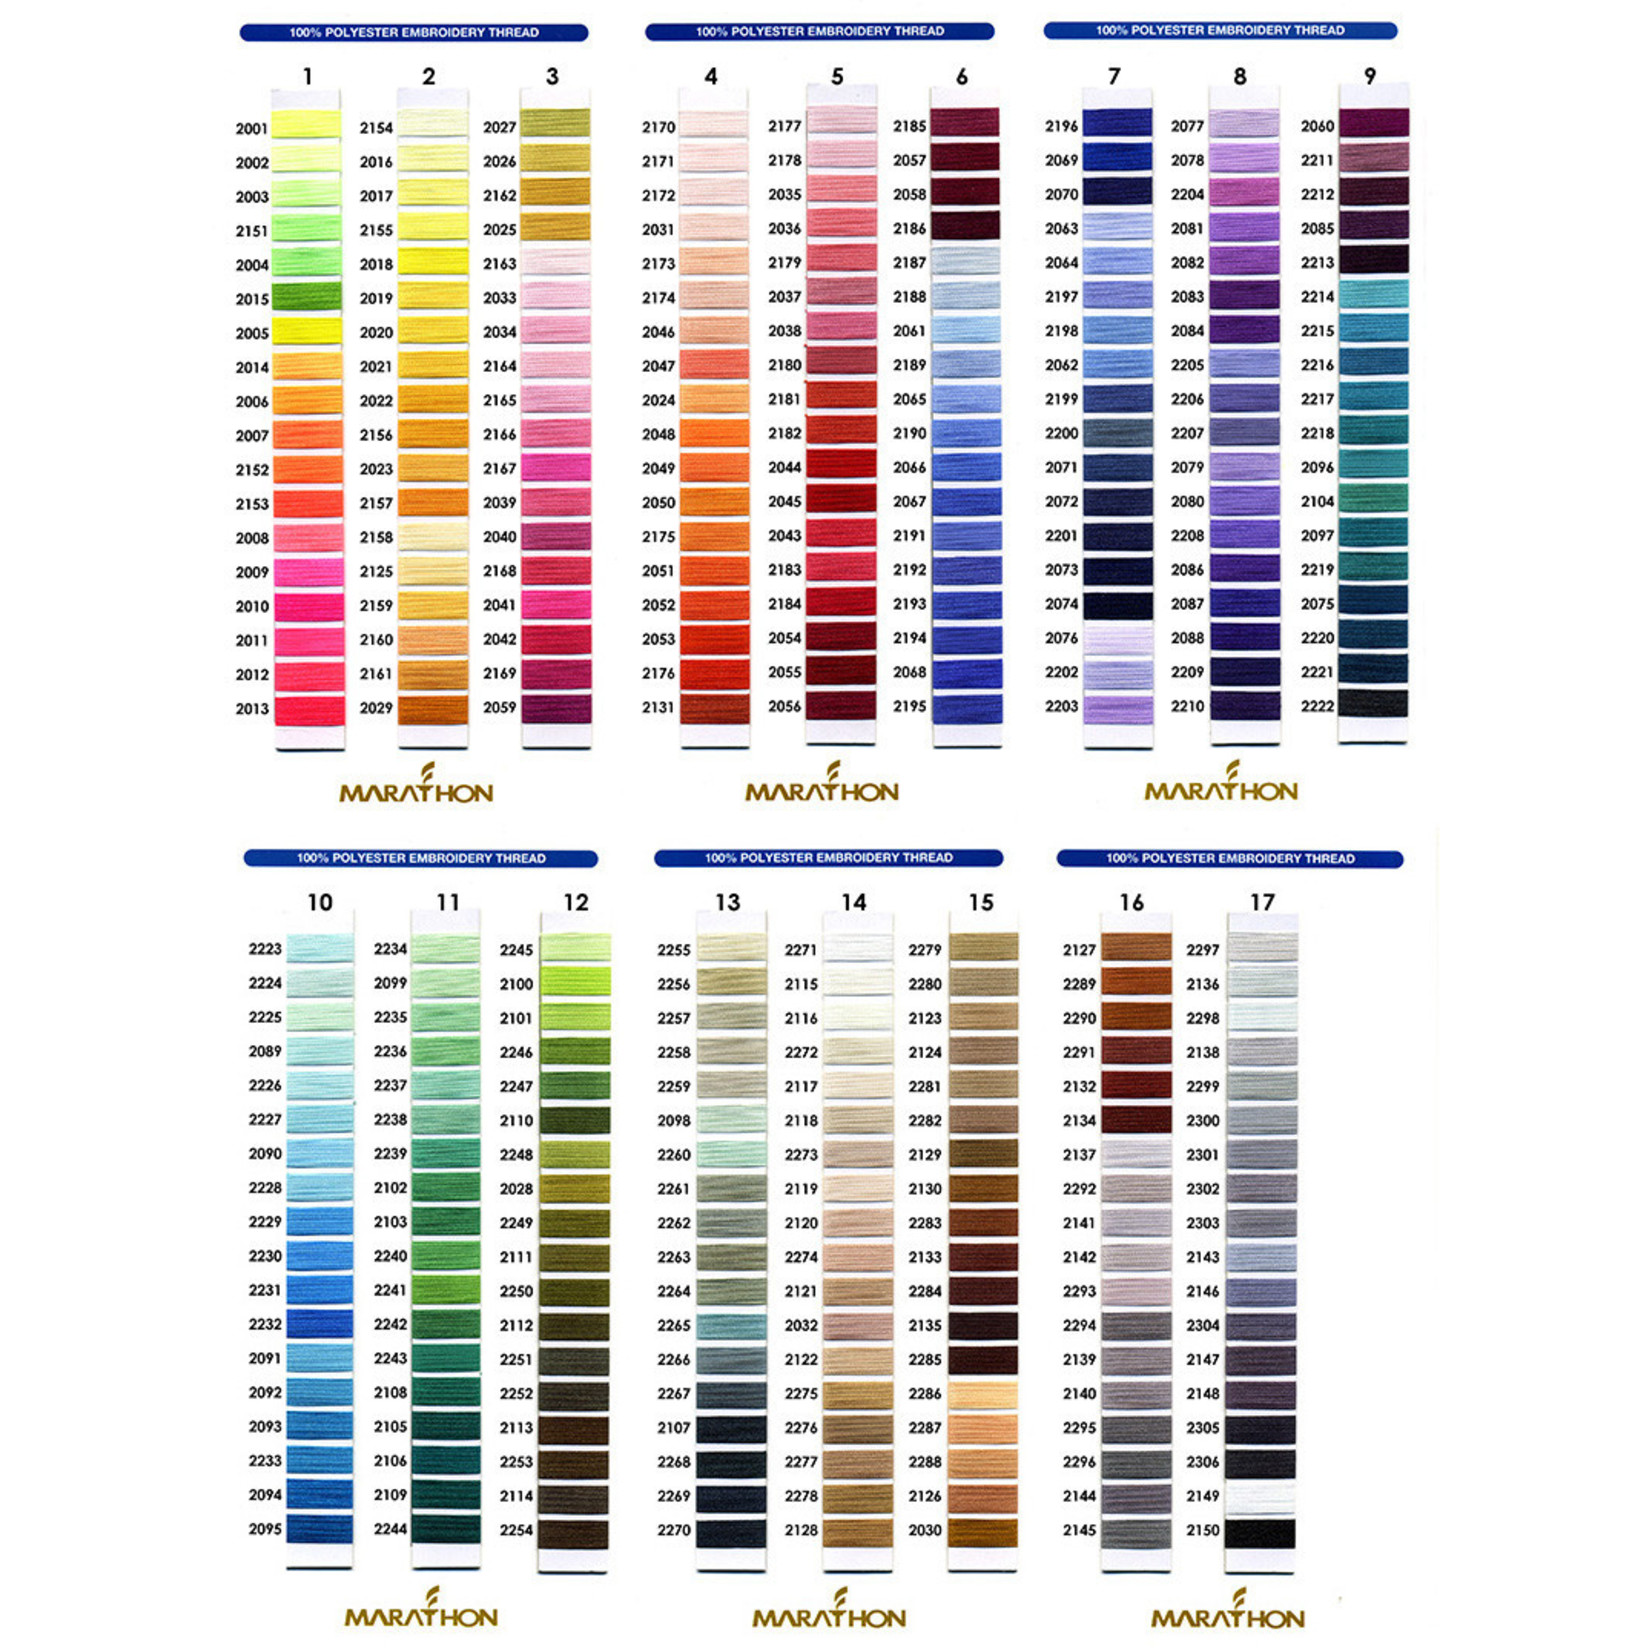 MARATHON Colour 2231 - 5000mtr POLY EMBROIDERY THREAD